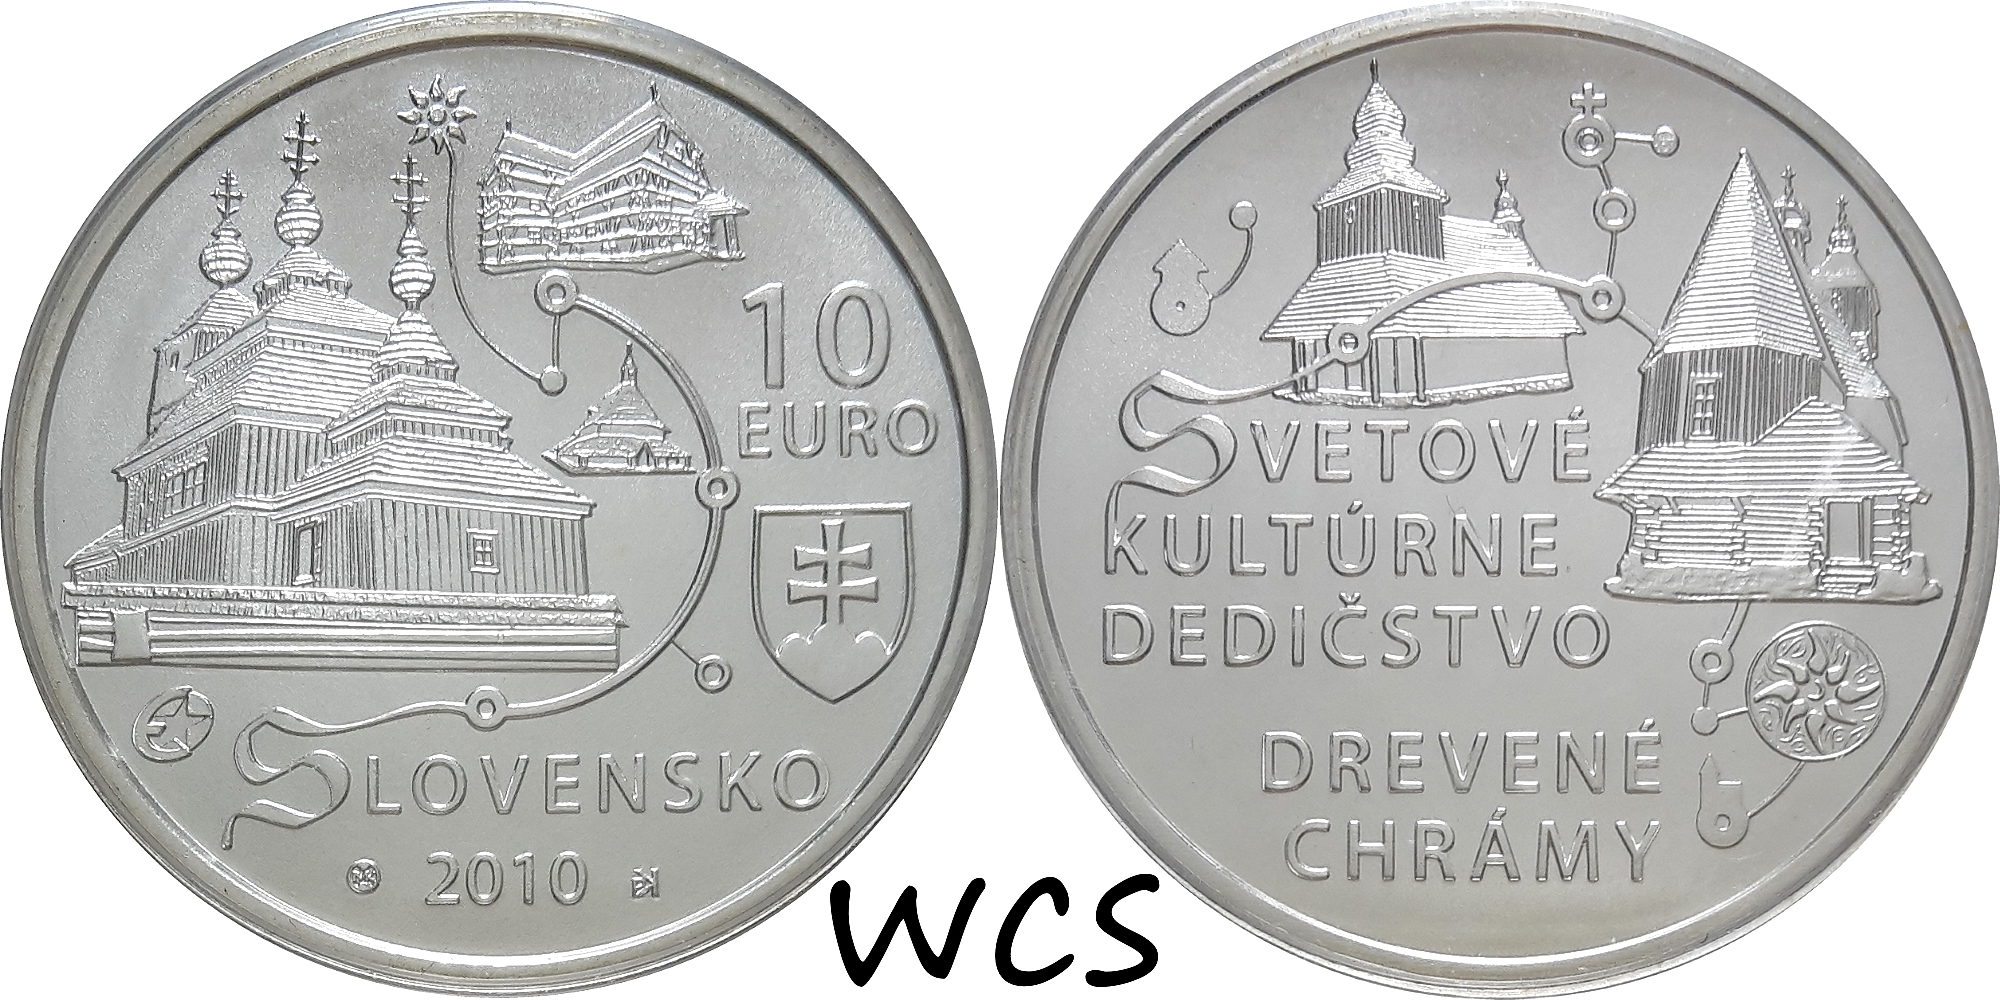 Slovakia 10 Euro 2010 - Wooden Churches of the Carpathian Slovakia - UNESCO World Heritage